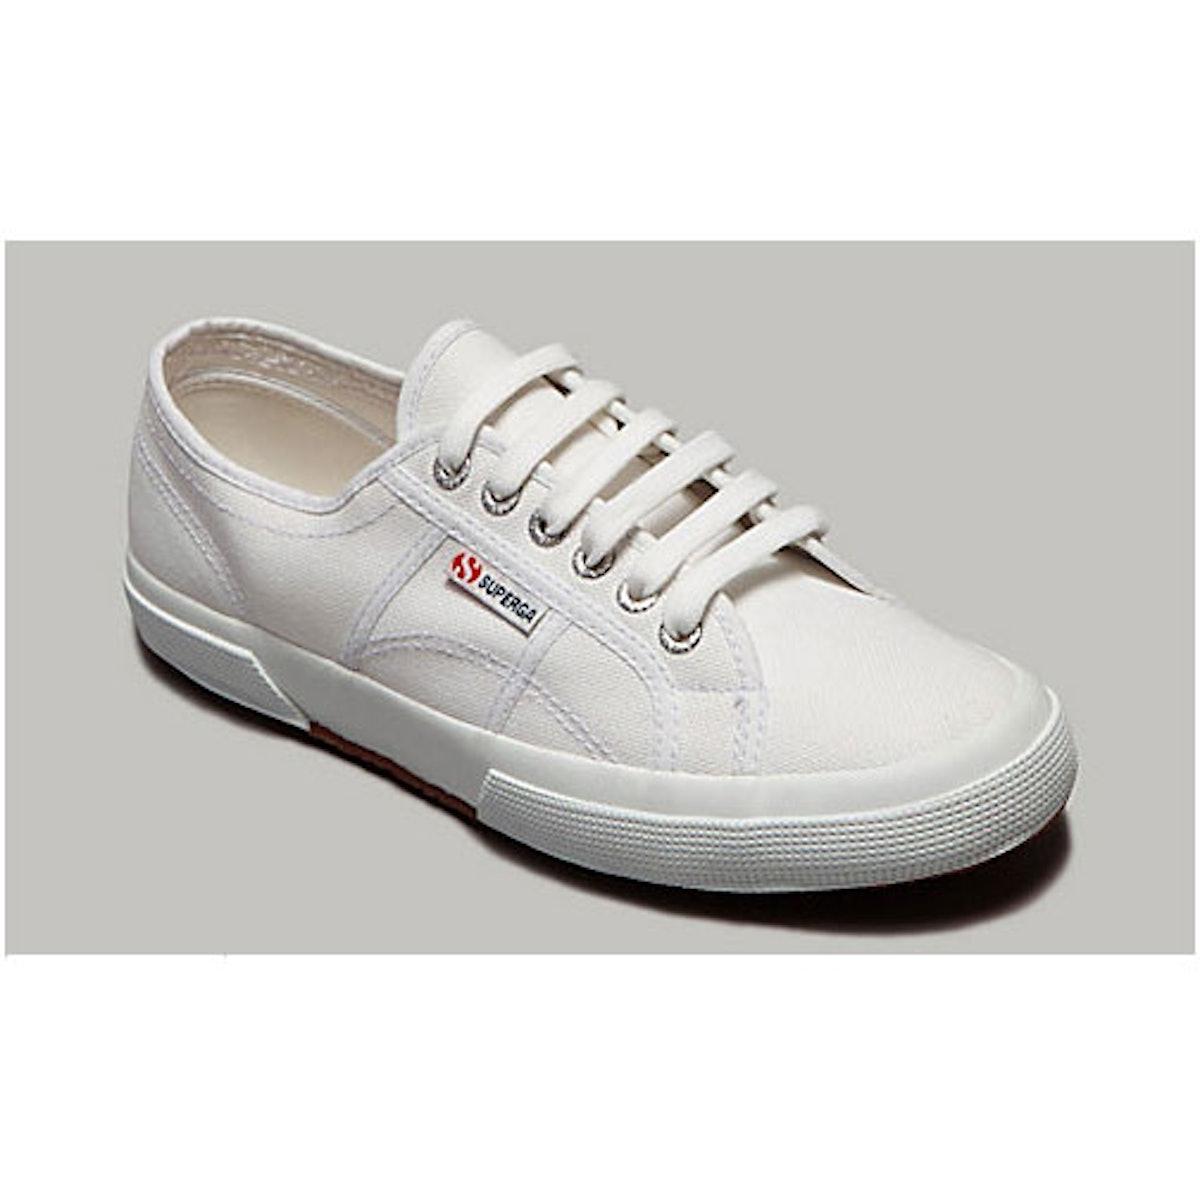 Superga Cotu classic white sneakers